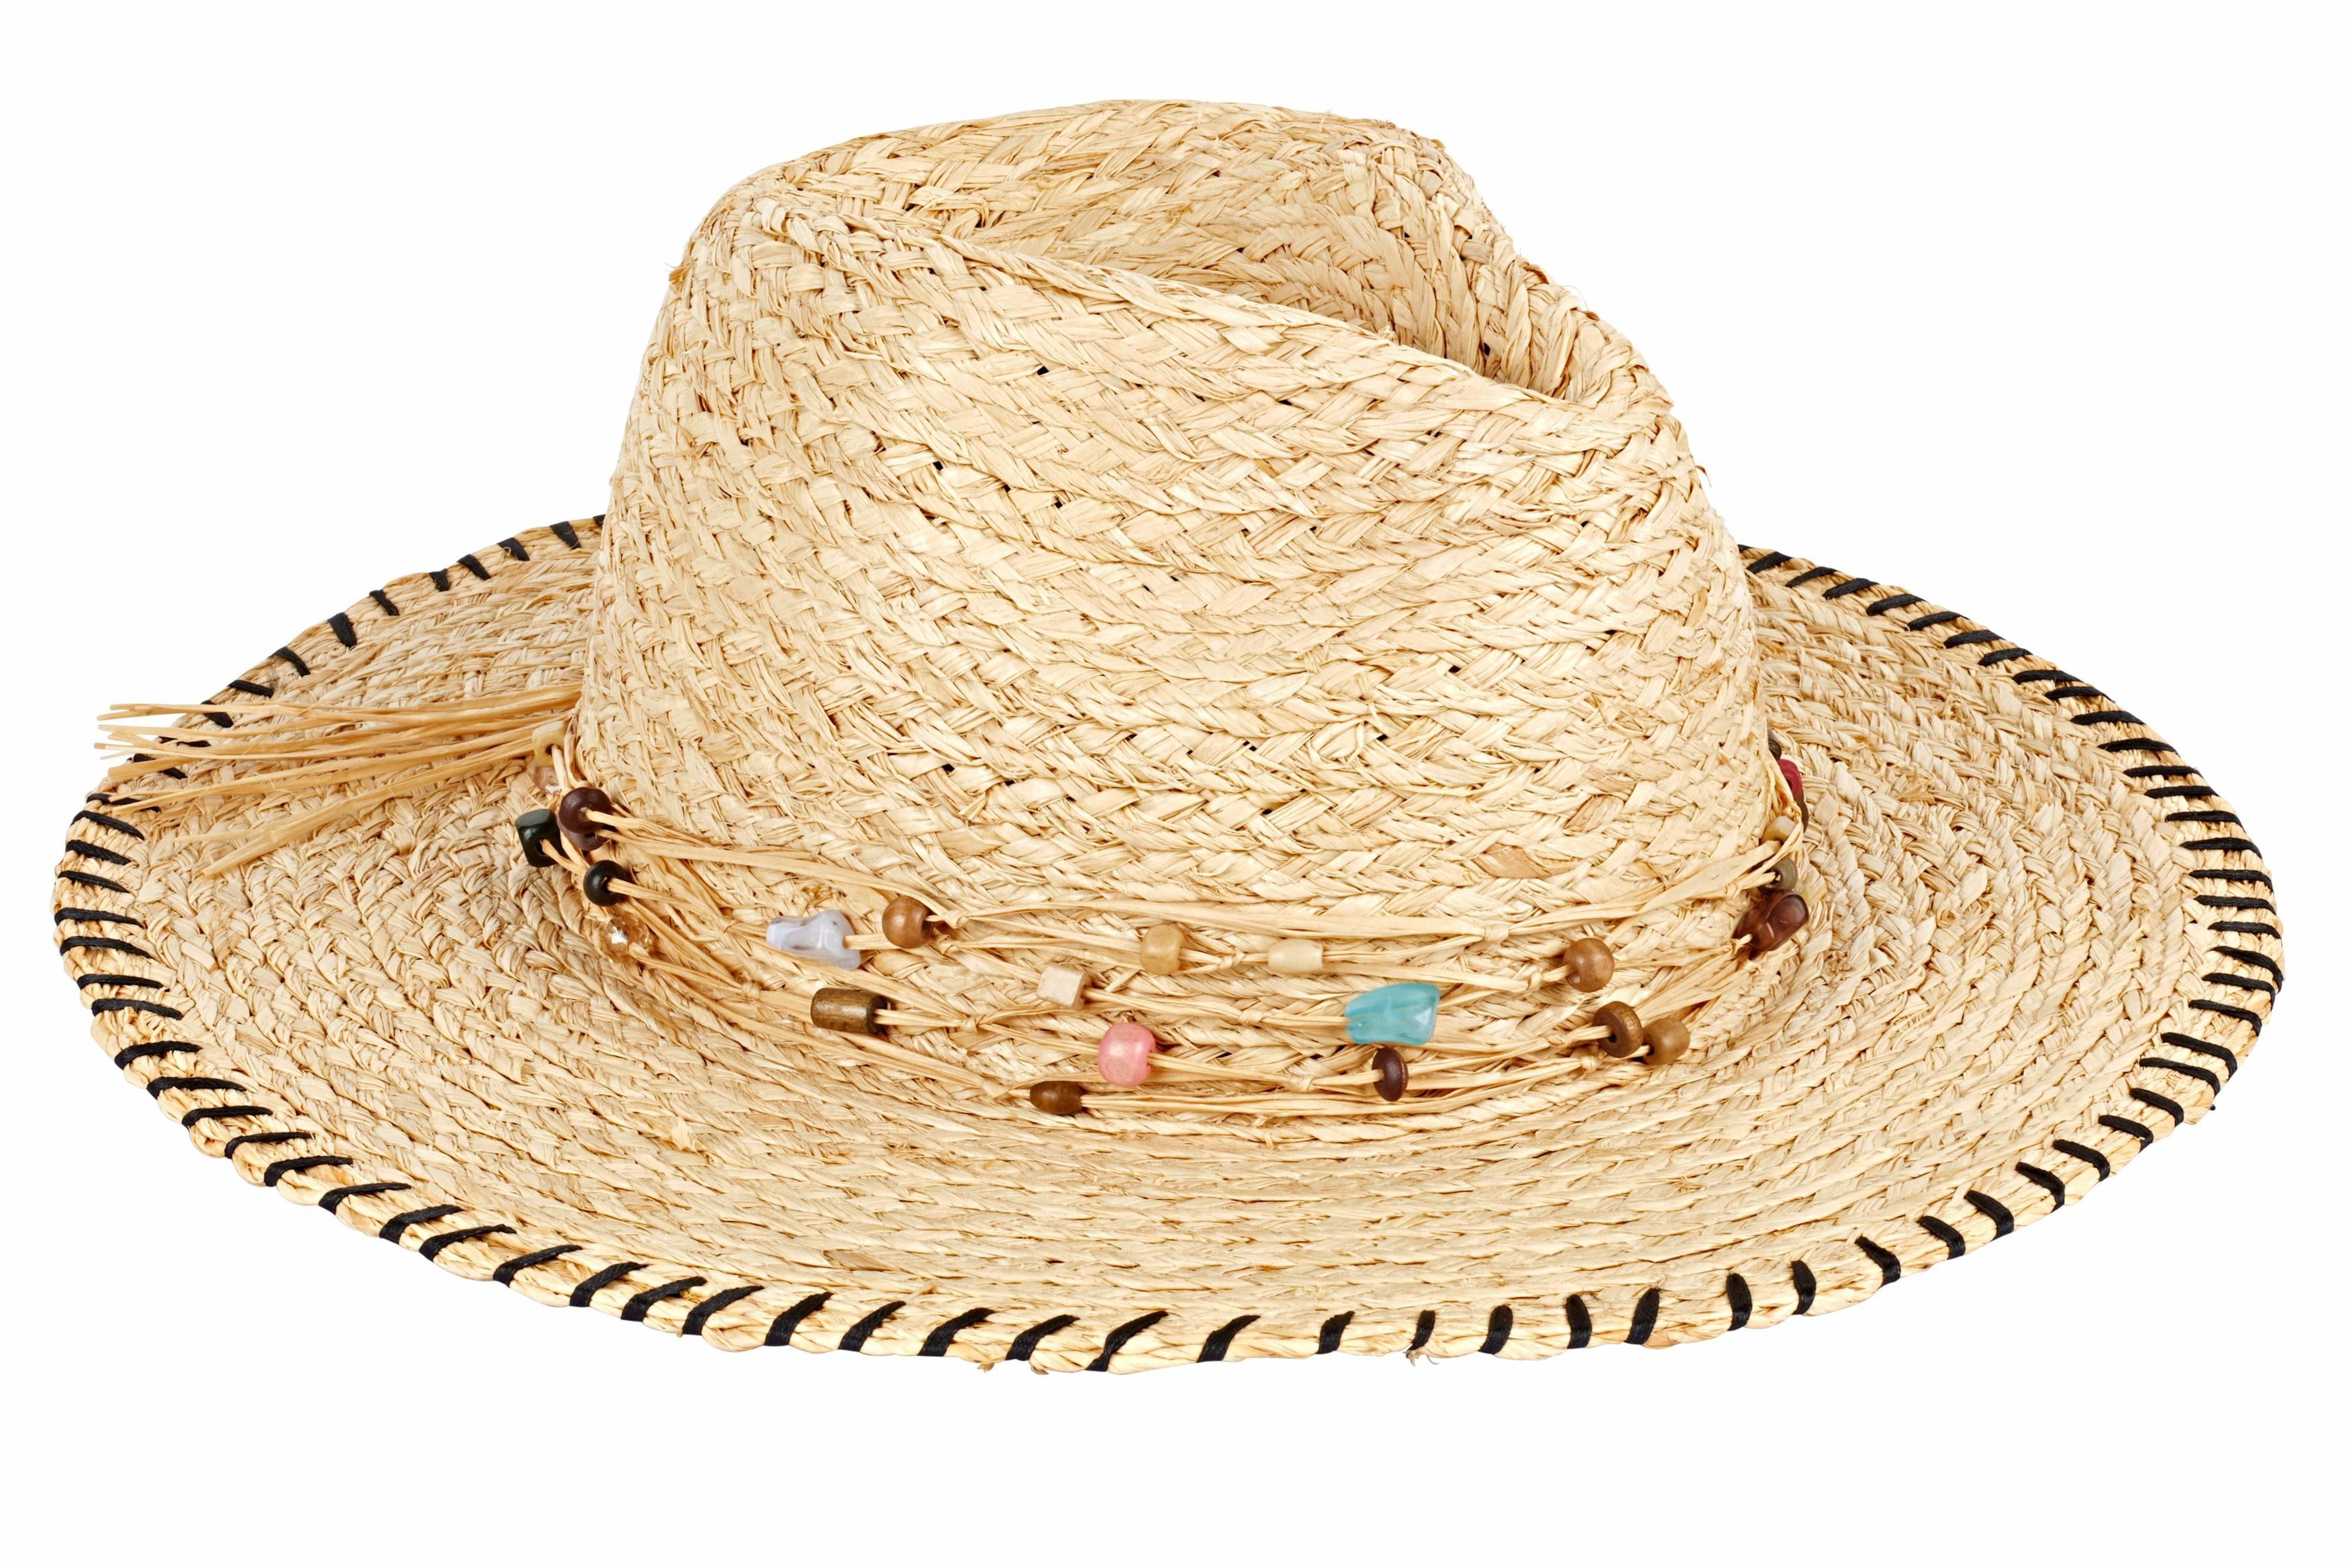 Loevenich Hut Cowboyform